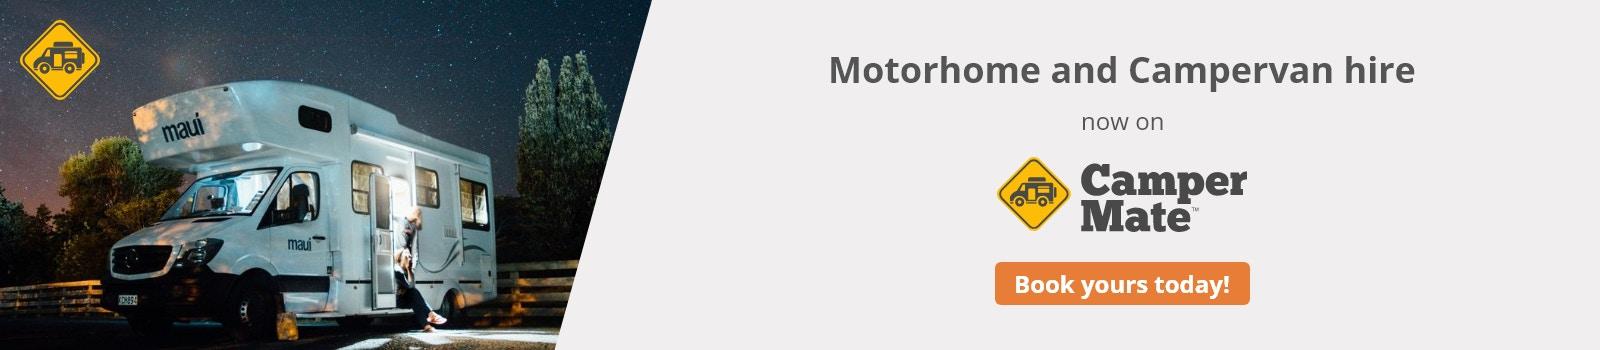 Motorhome and Campervan Hire